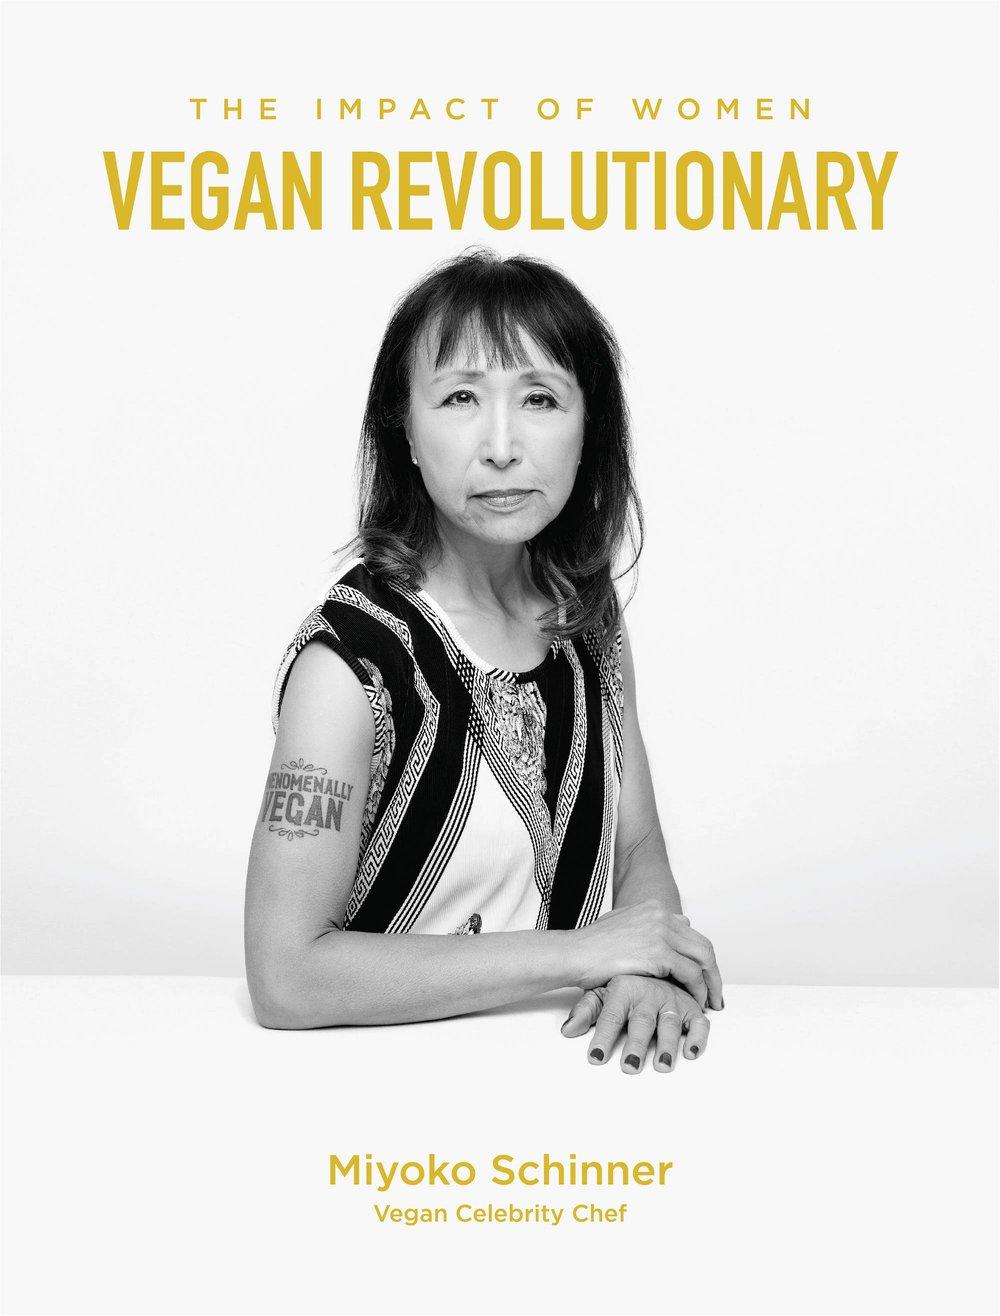 Miyoko Schinner is a Vegan Revolutionary